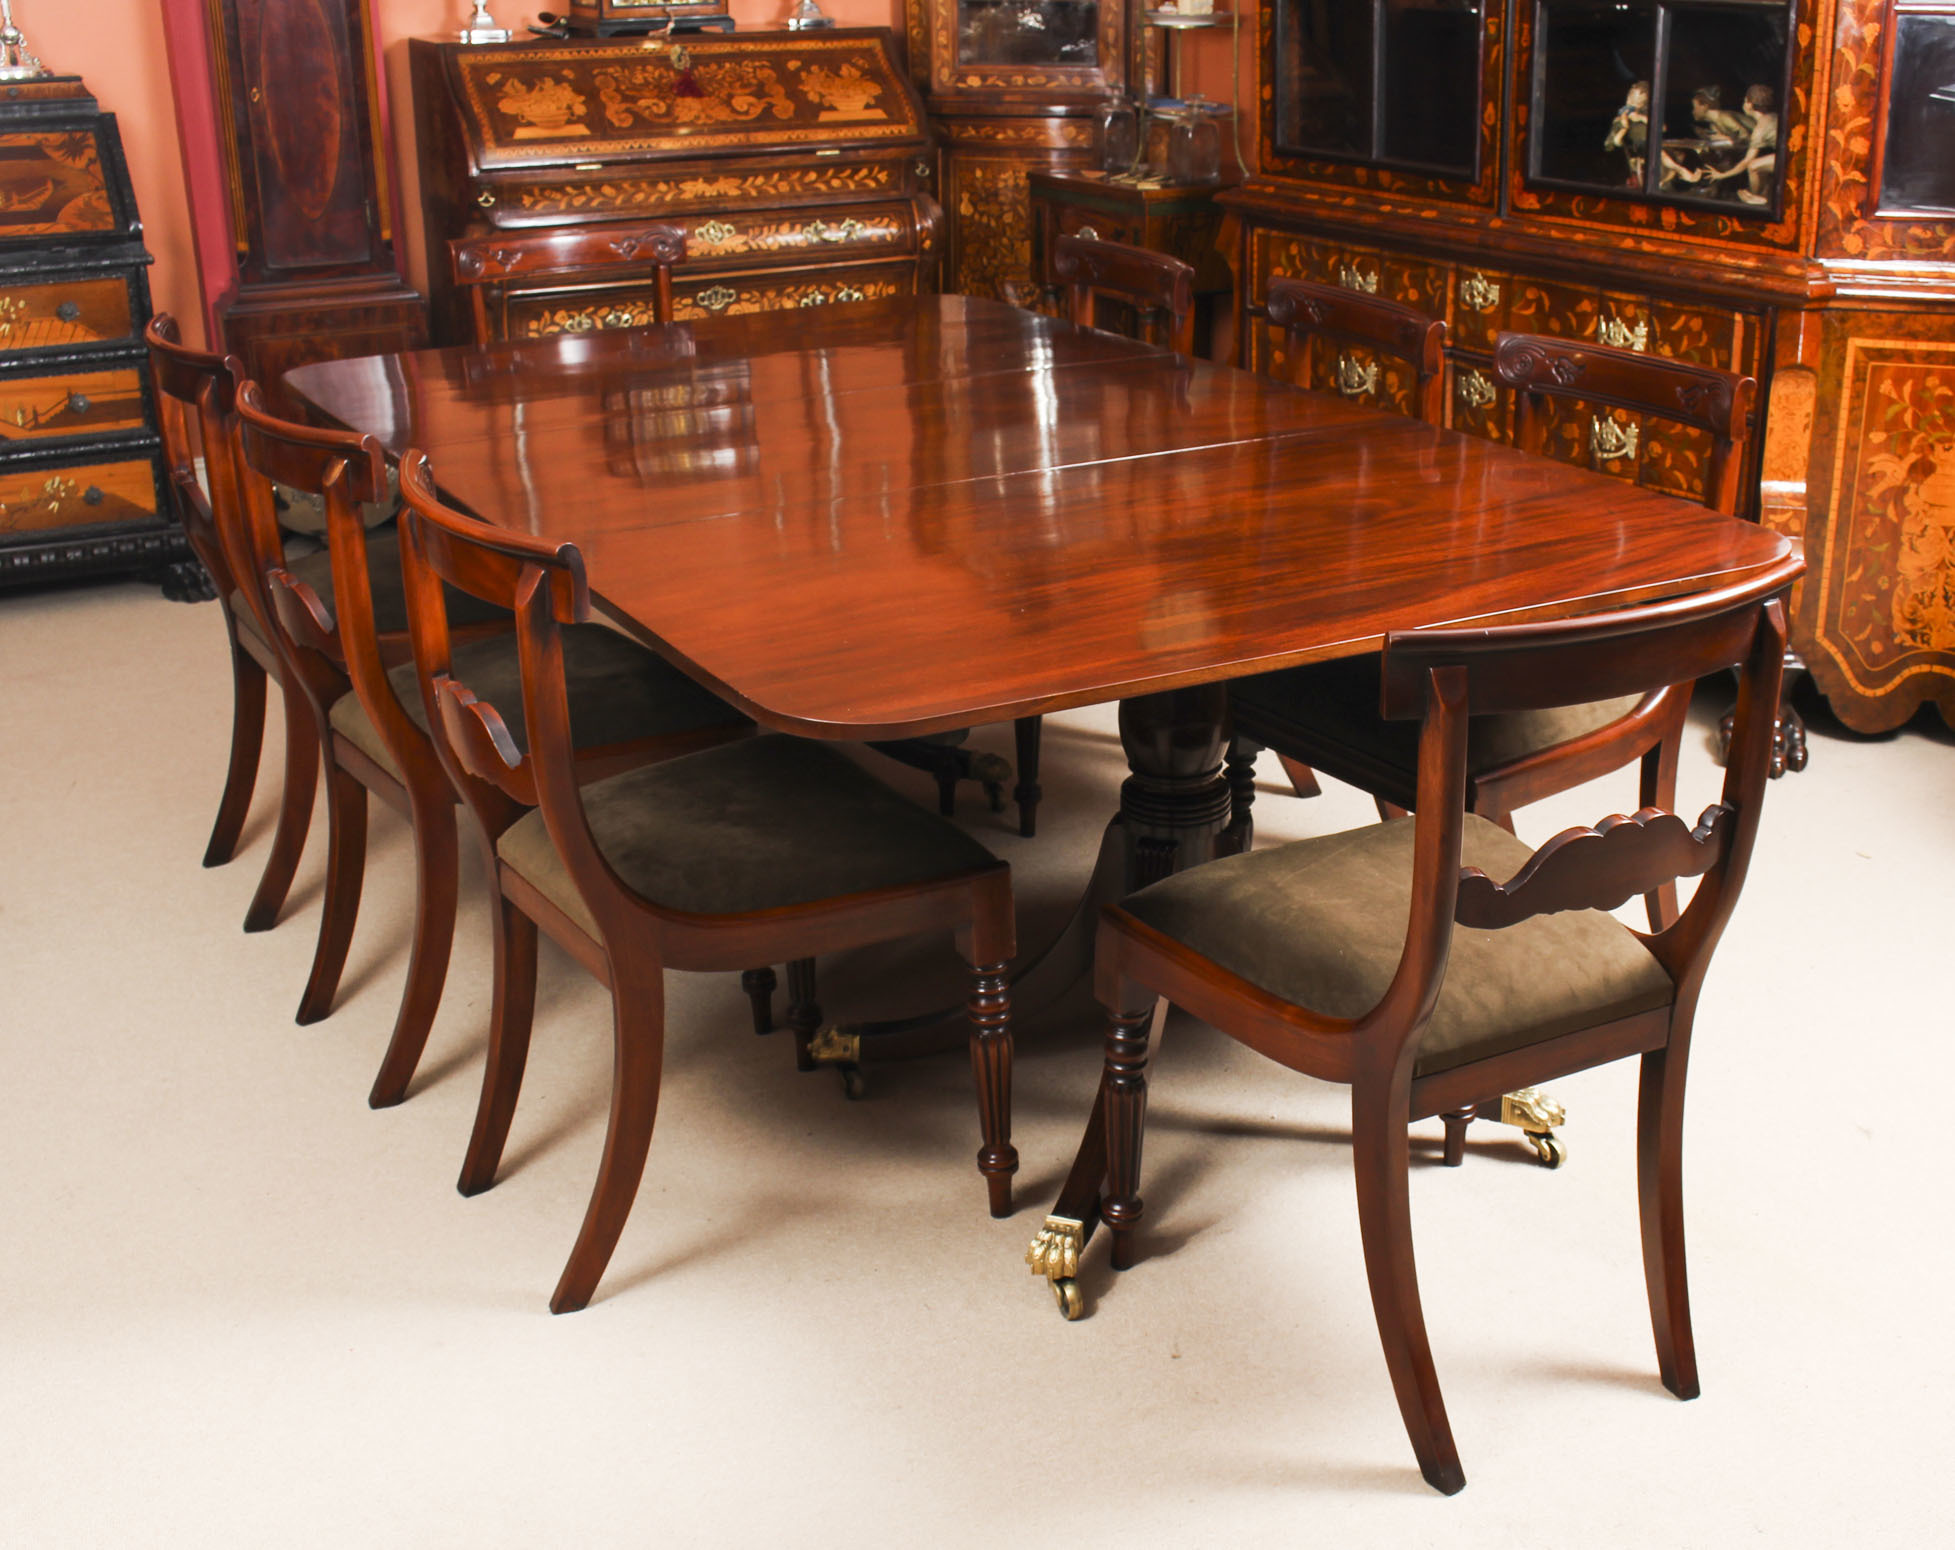 Antique Twin Pillar Regency Dining Table C1820 19th C 8 Vintage Chairs Vinterior